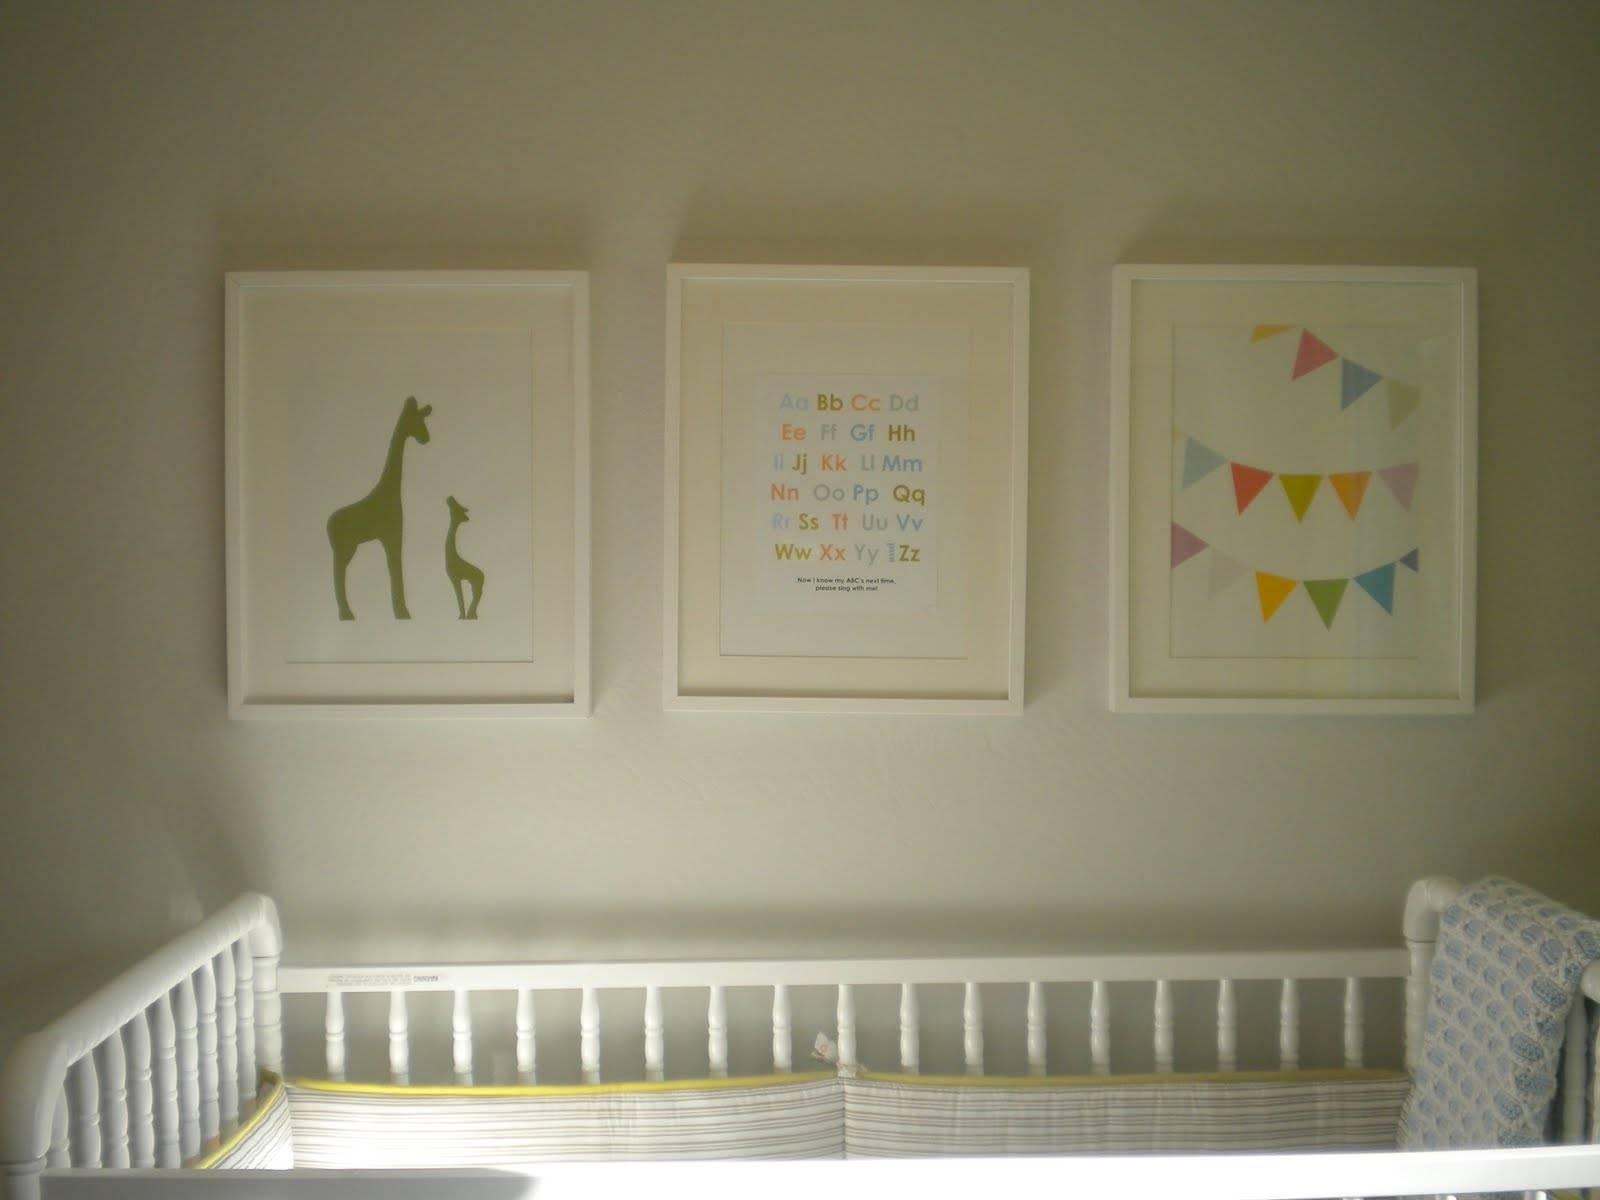 Project Nursery: Nursery Artwork – Home Depot Center In Recent Nursery Framed Wall Art (View 13 of 20)